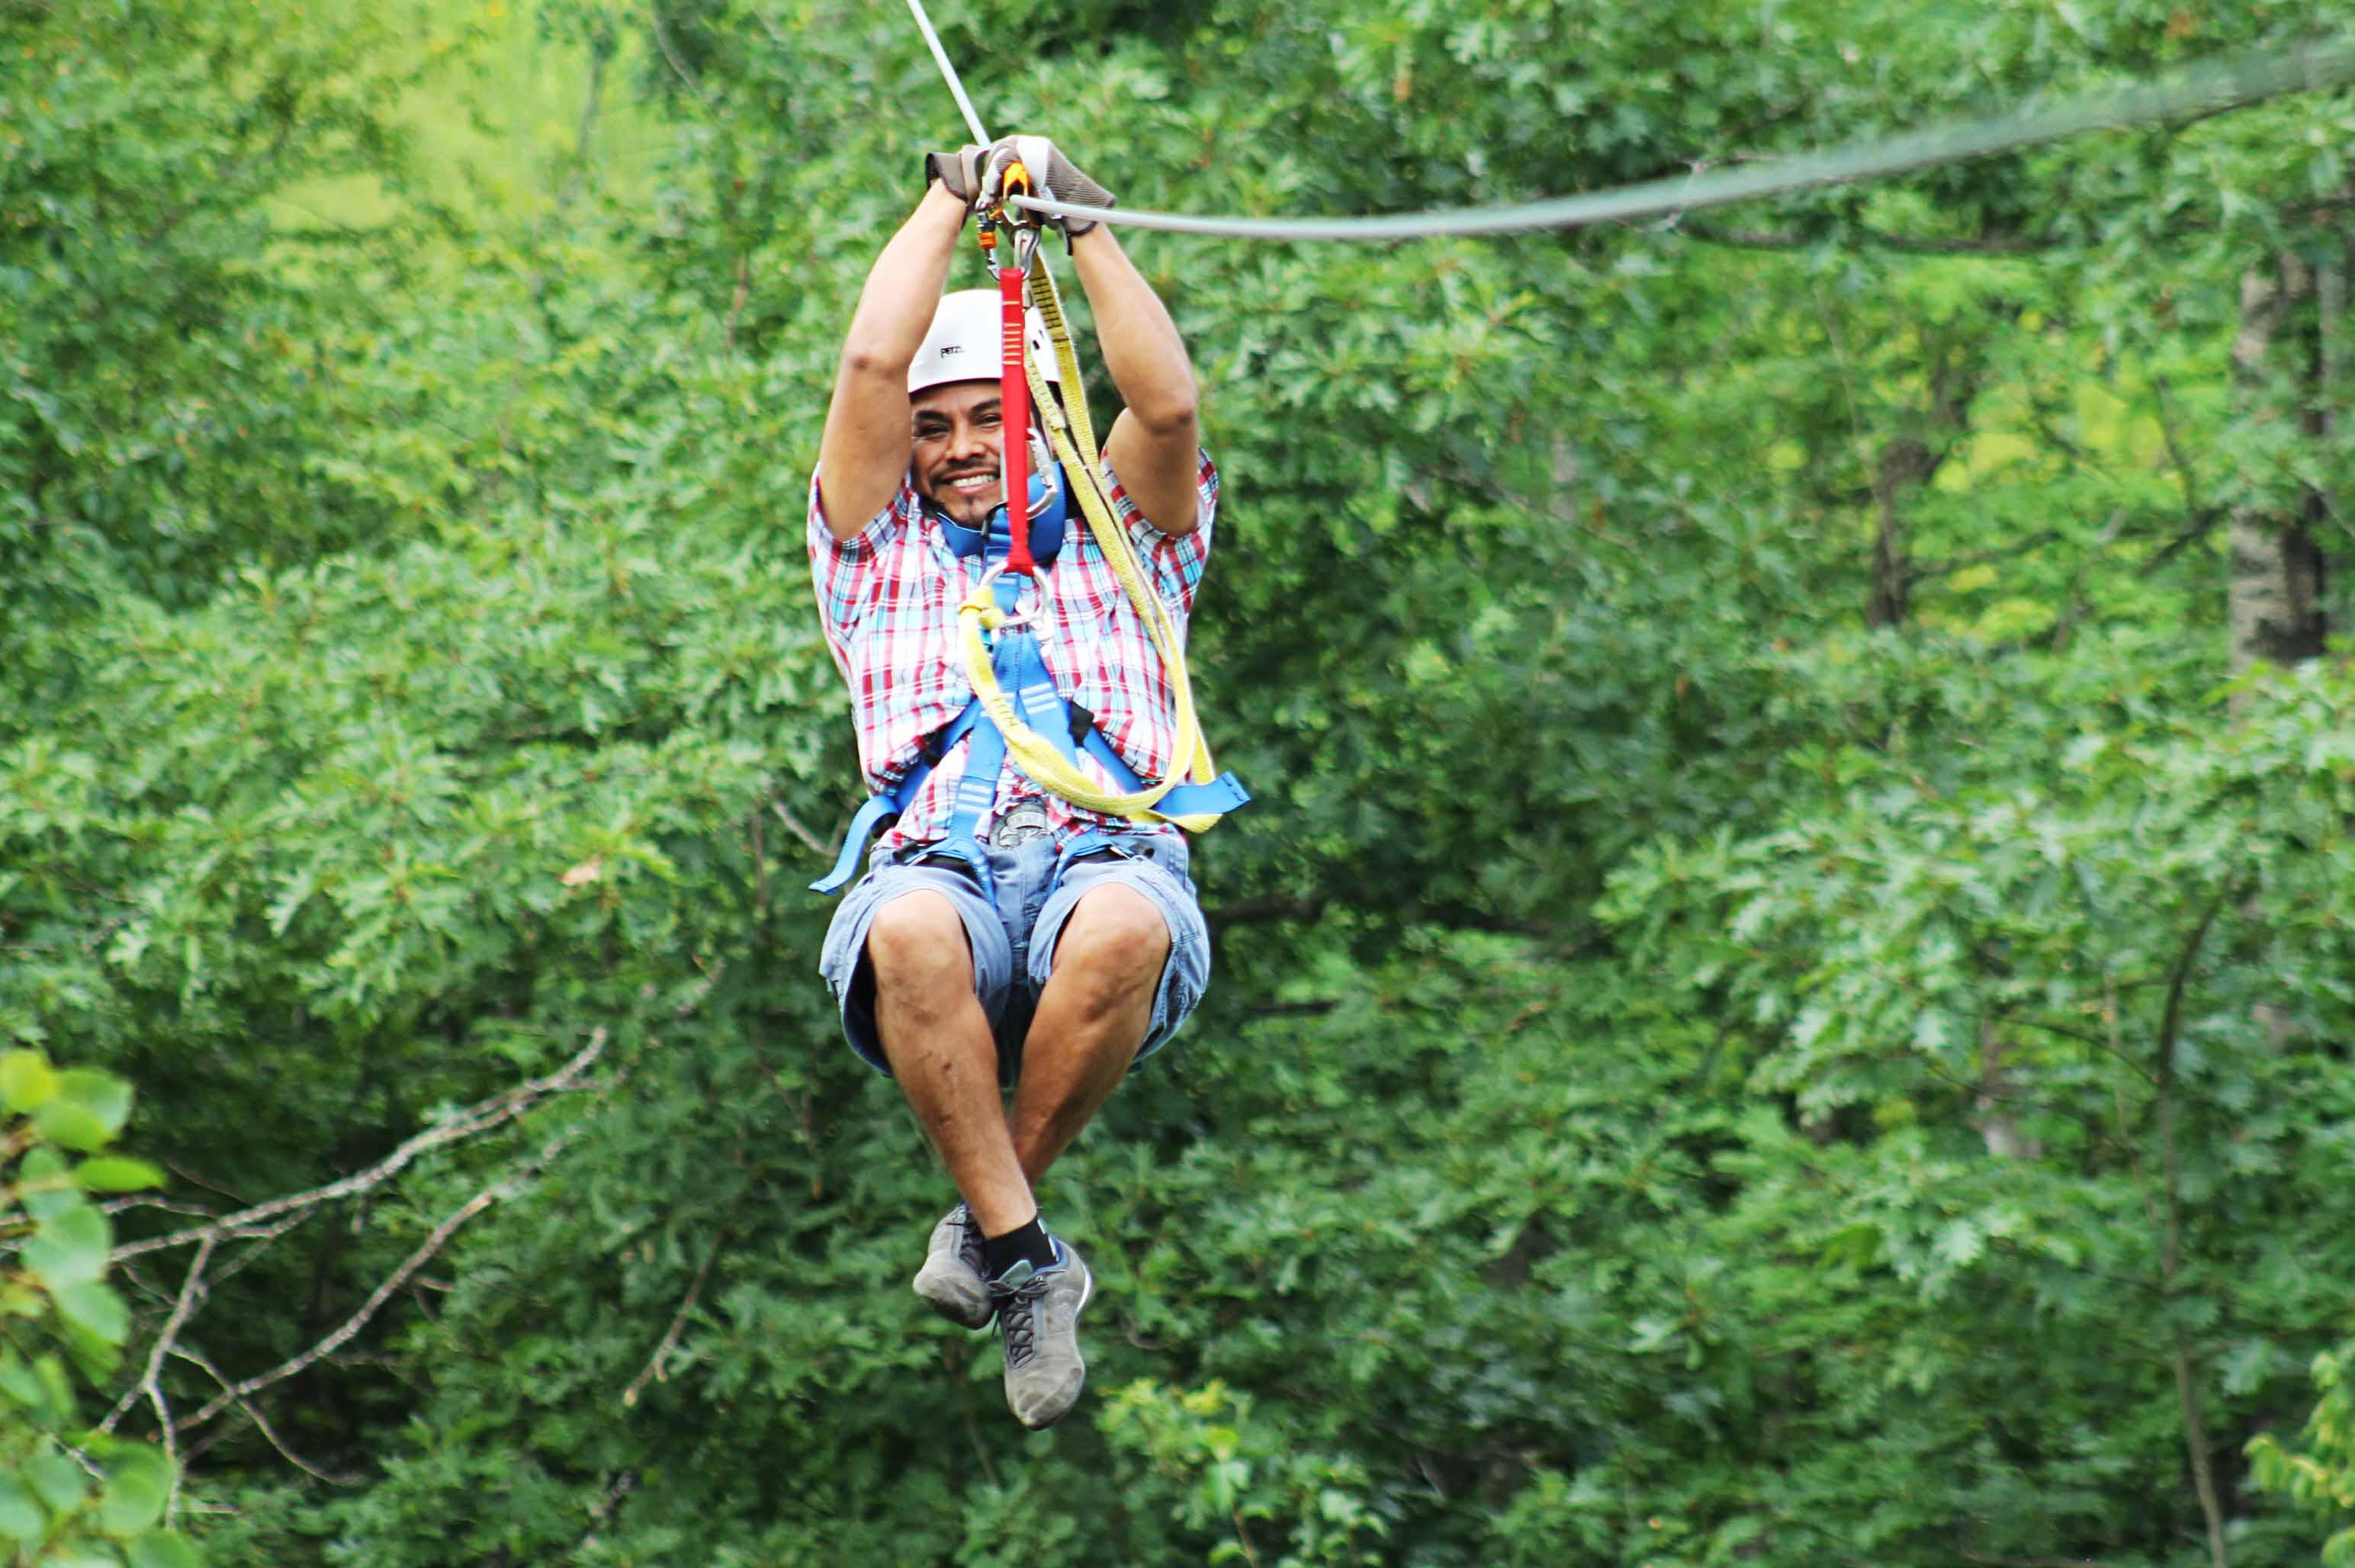 Man zips over trees on Brainerd course